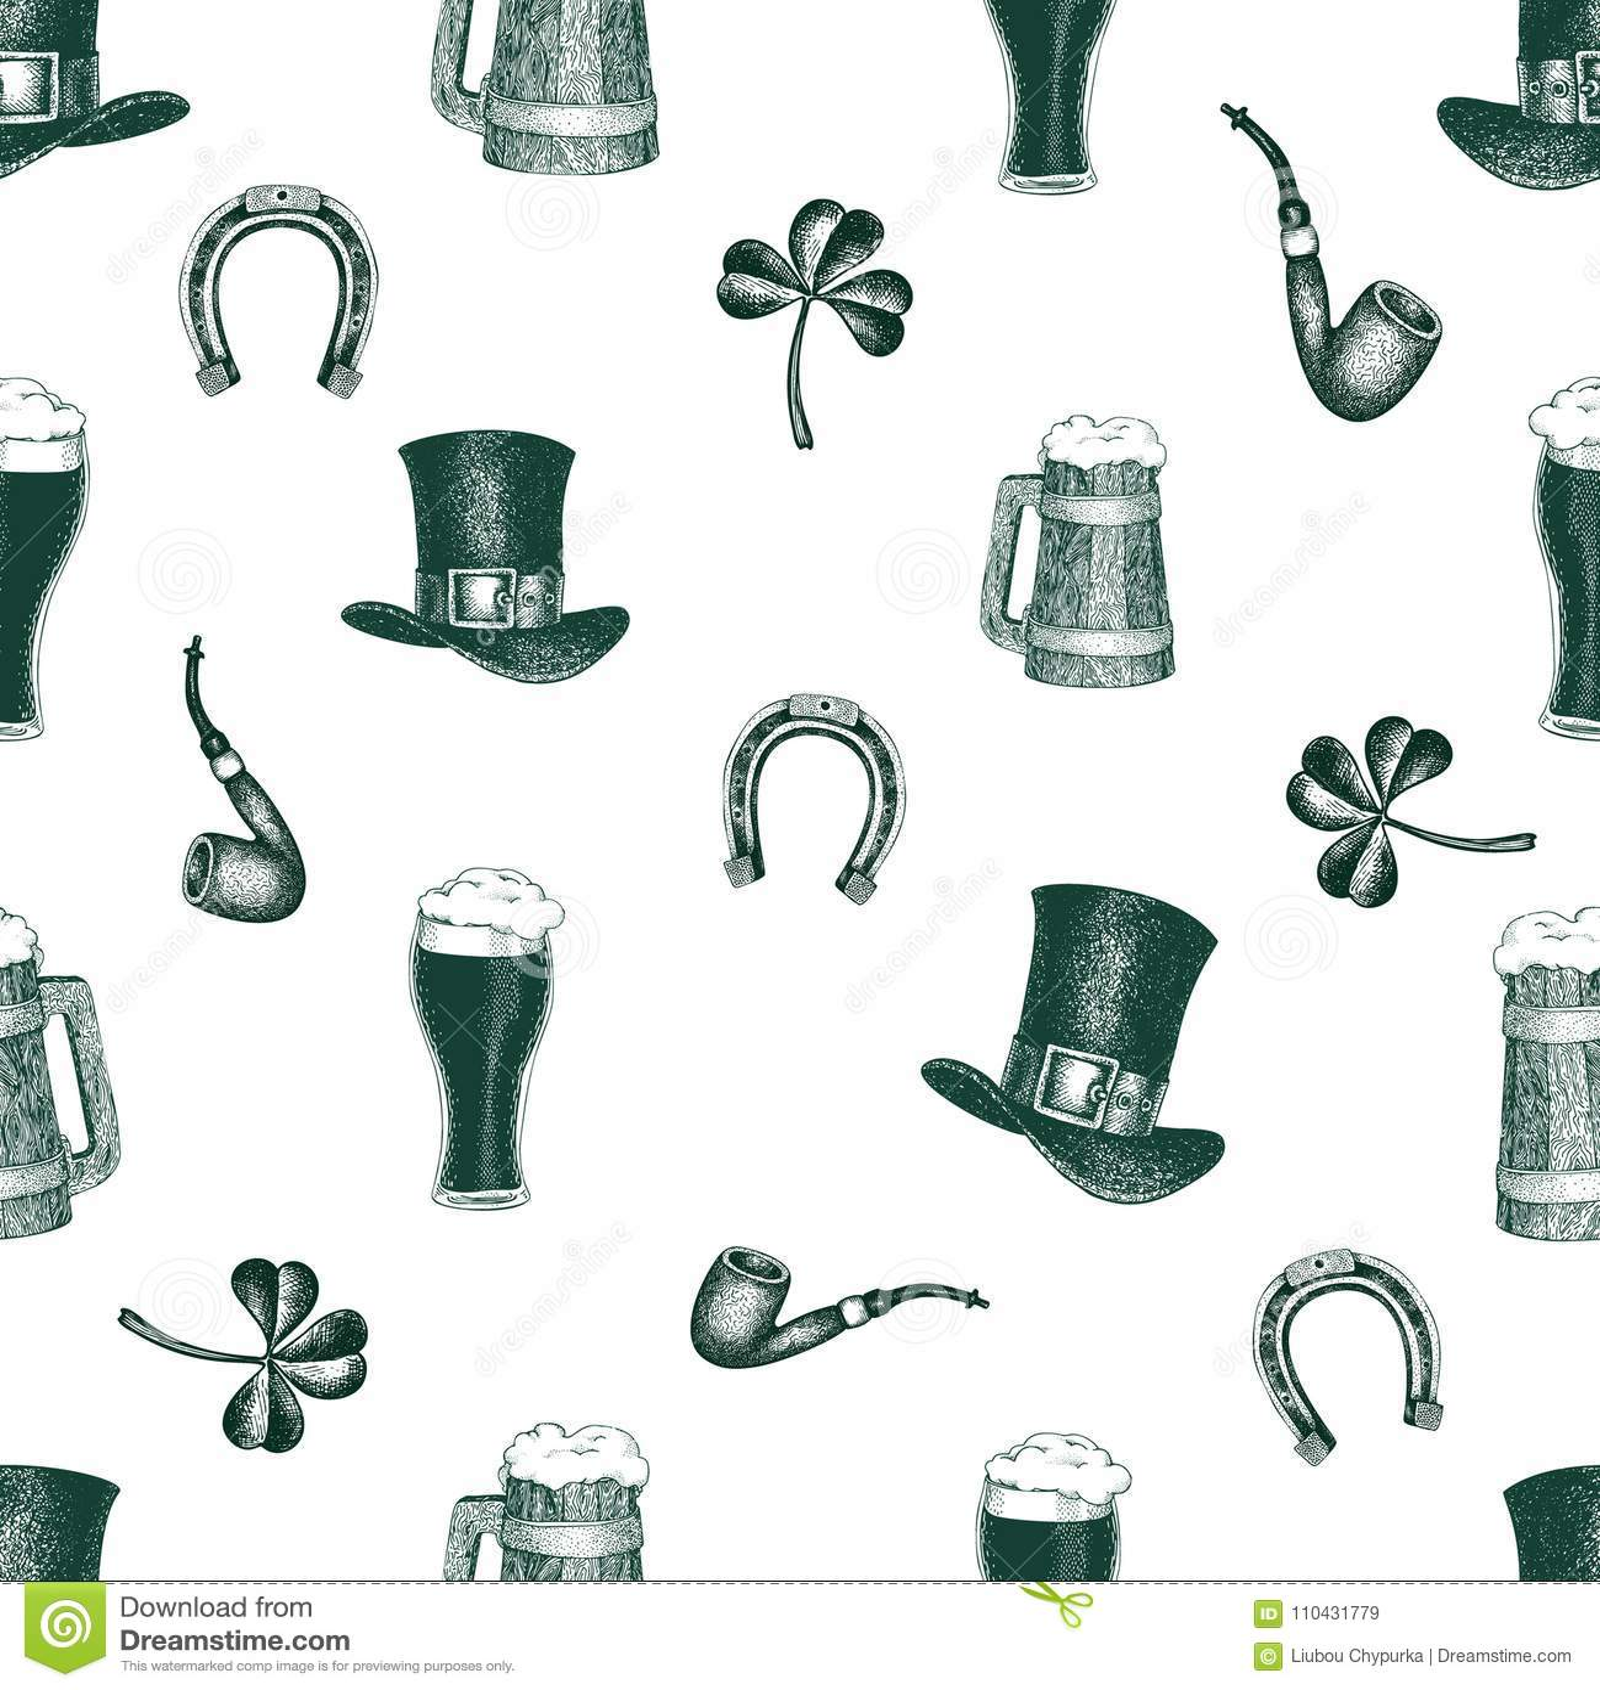 9f1f3ecd Hand drawn vector seamles pattern with leprechaun hat, clover, beer mug,  barrel, golden coin pot for St. Patrick s Day. Irish vintage illustration.